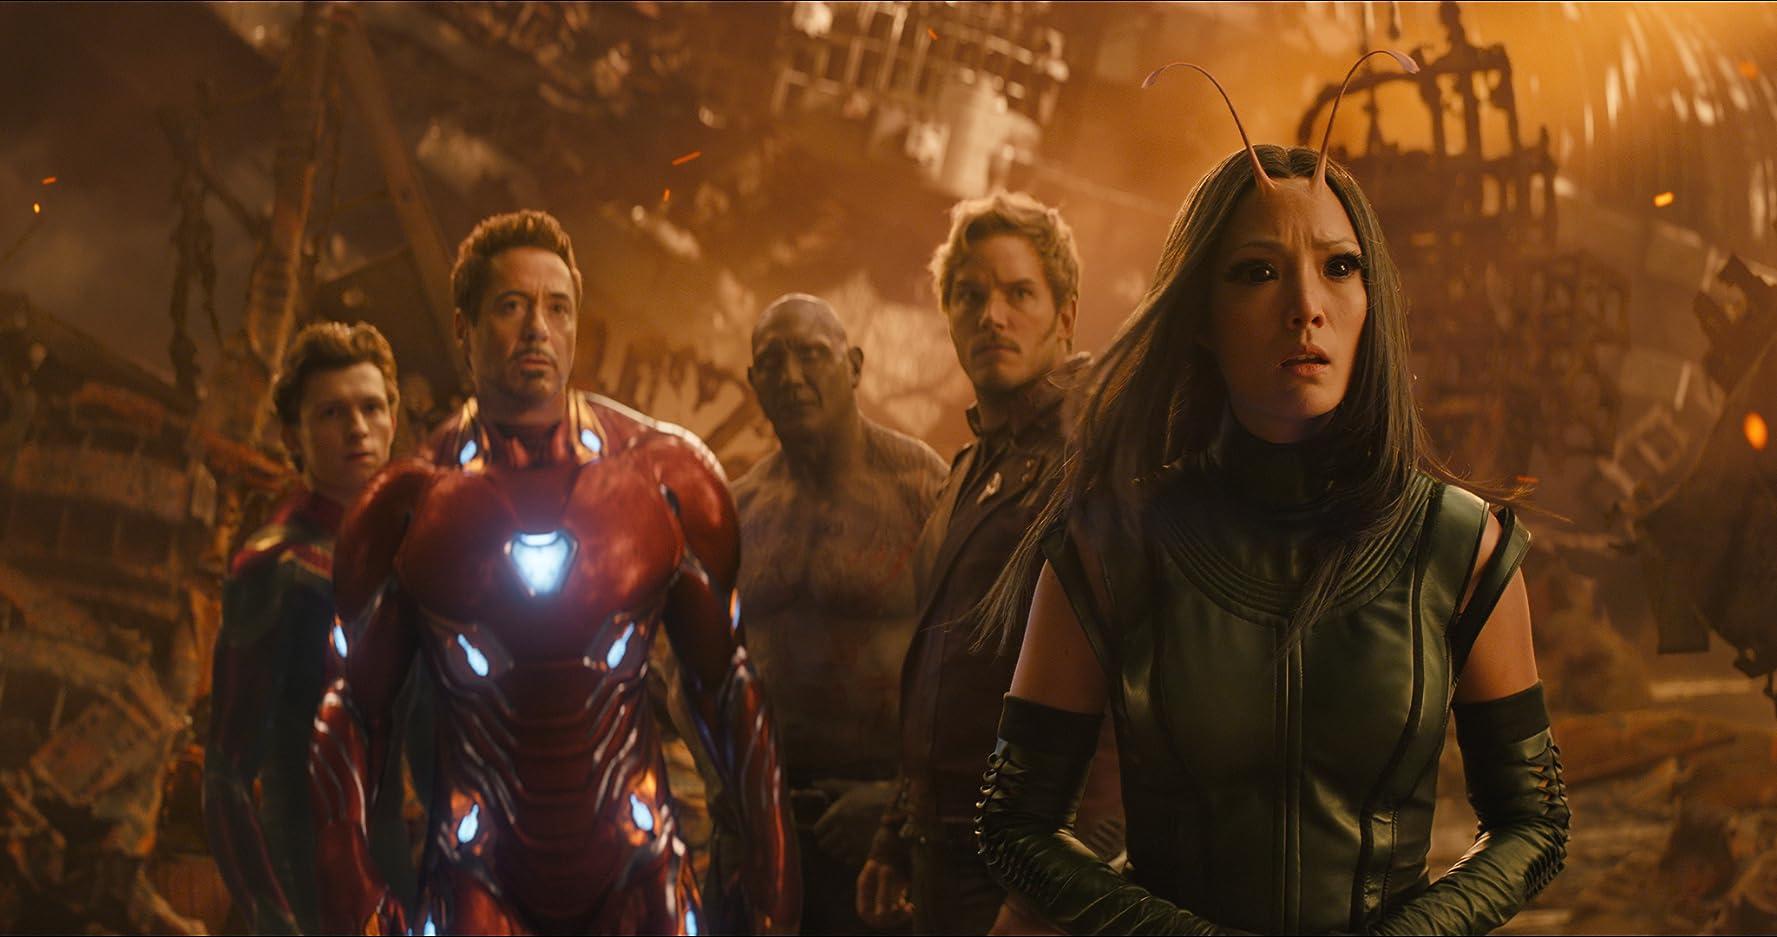 Robert Downey Jr., Chris Pratt, Dave Bautista, Pom Klementieff, and Tom Holland in Avengers: Infinity War (2018)